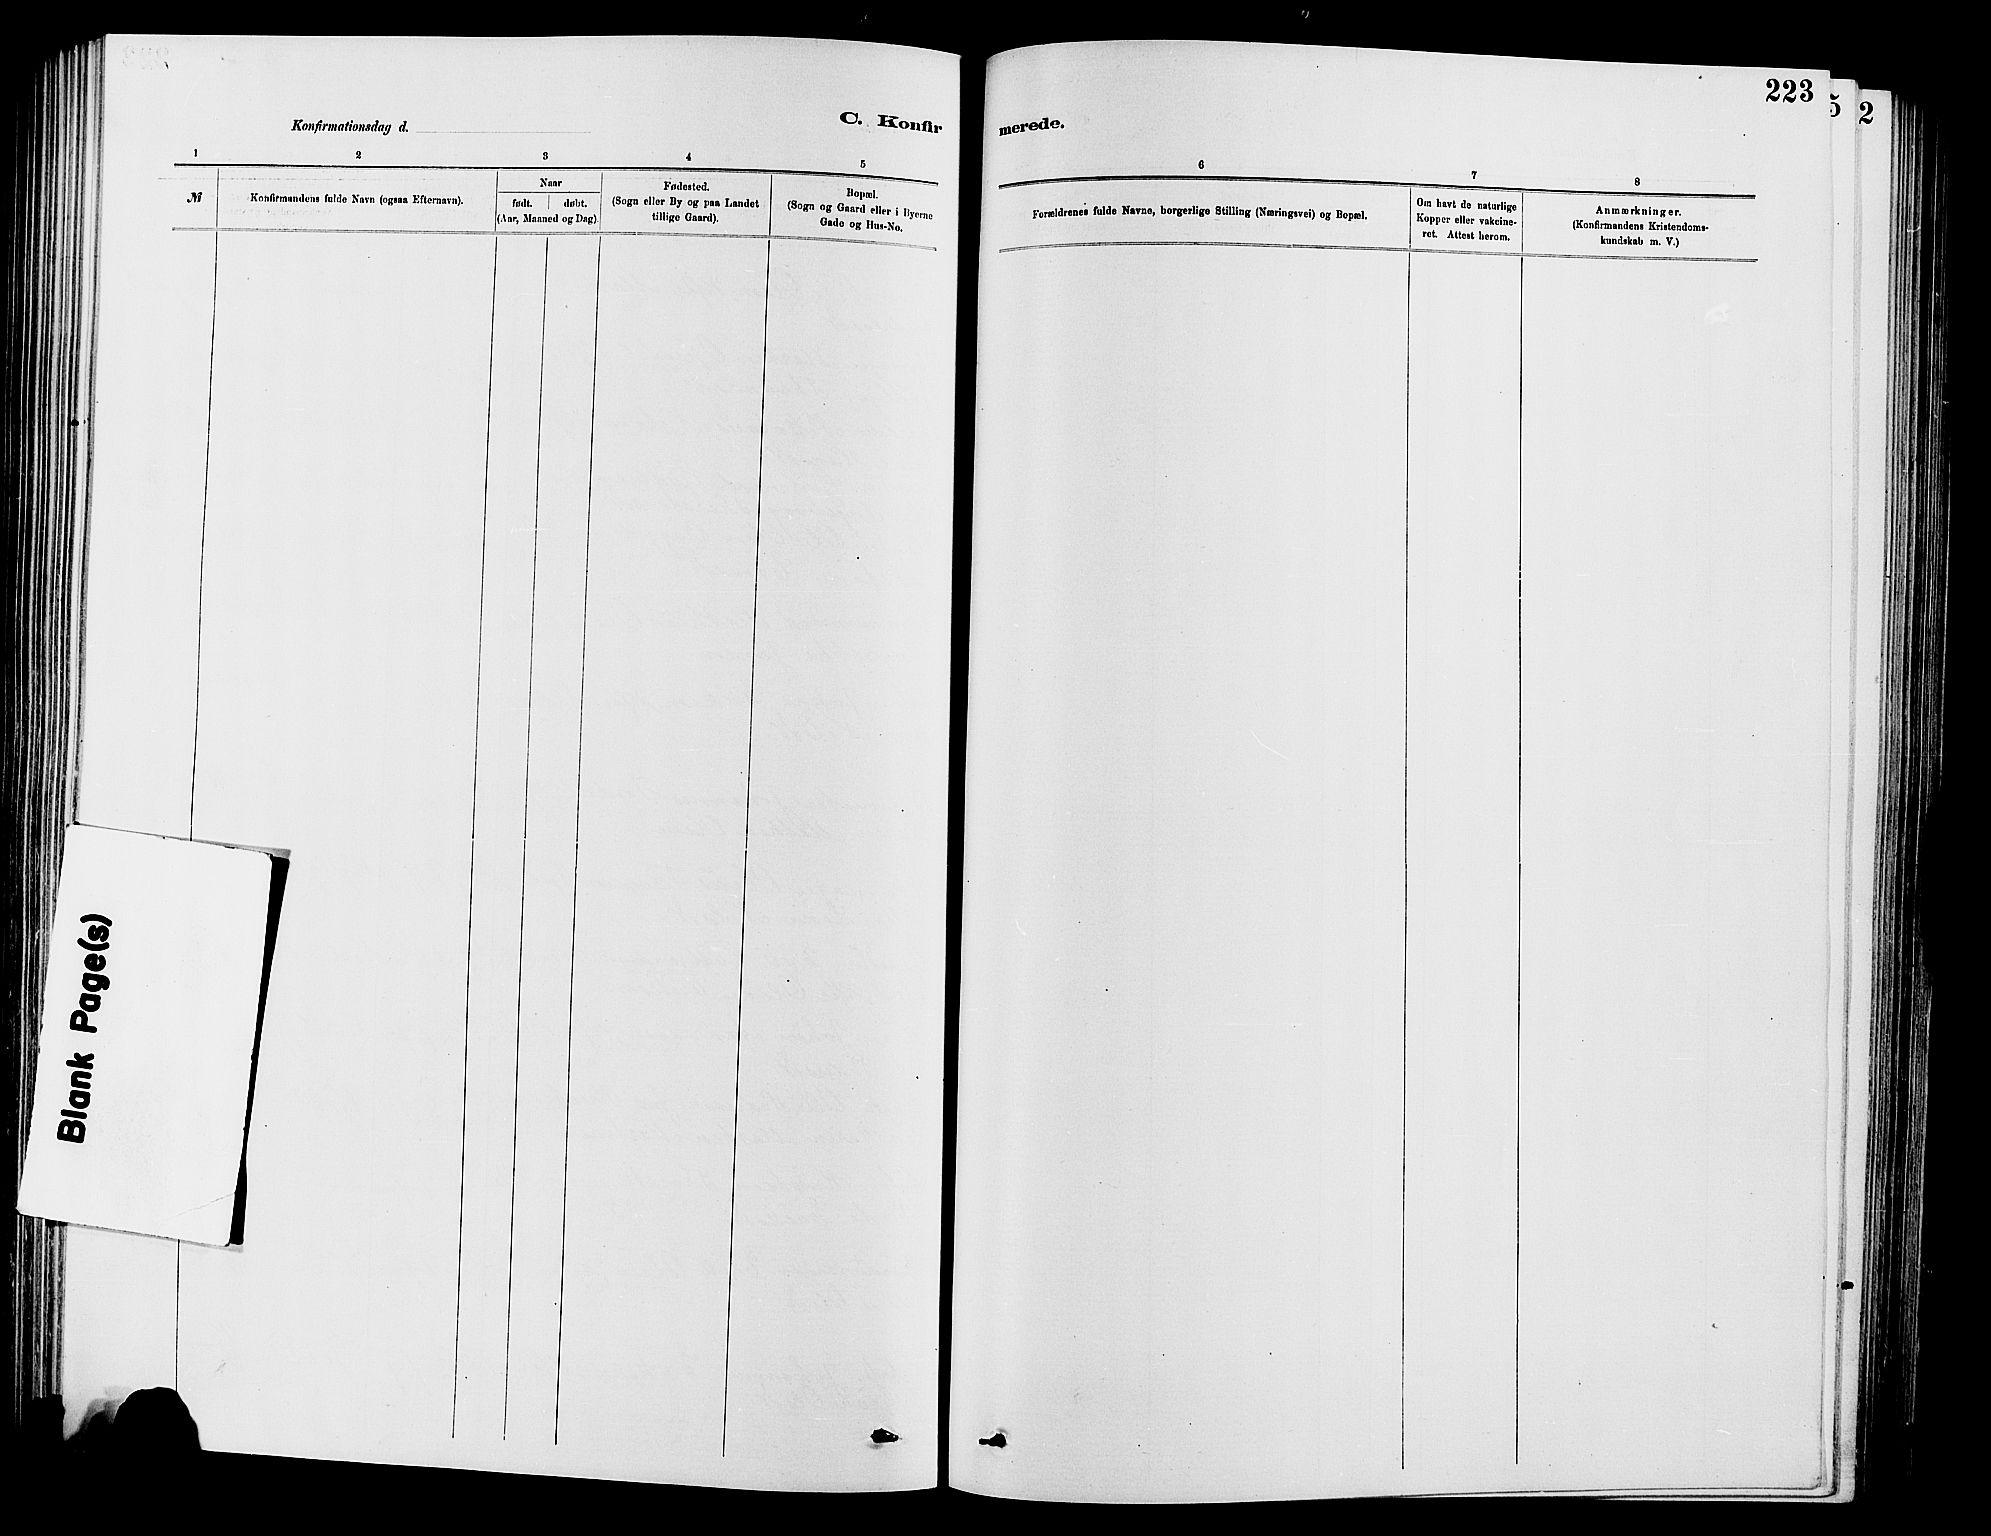 SAH, Vardal prestekontor, H/Ha/Hab/L0007: Klokkerbok nr. 7 /2, 1881-1895, s. 223